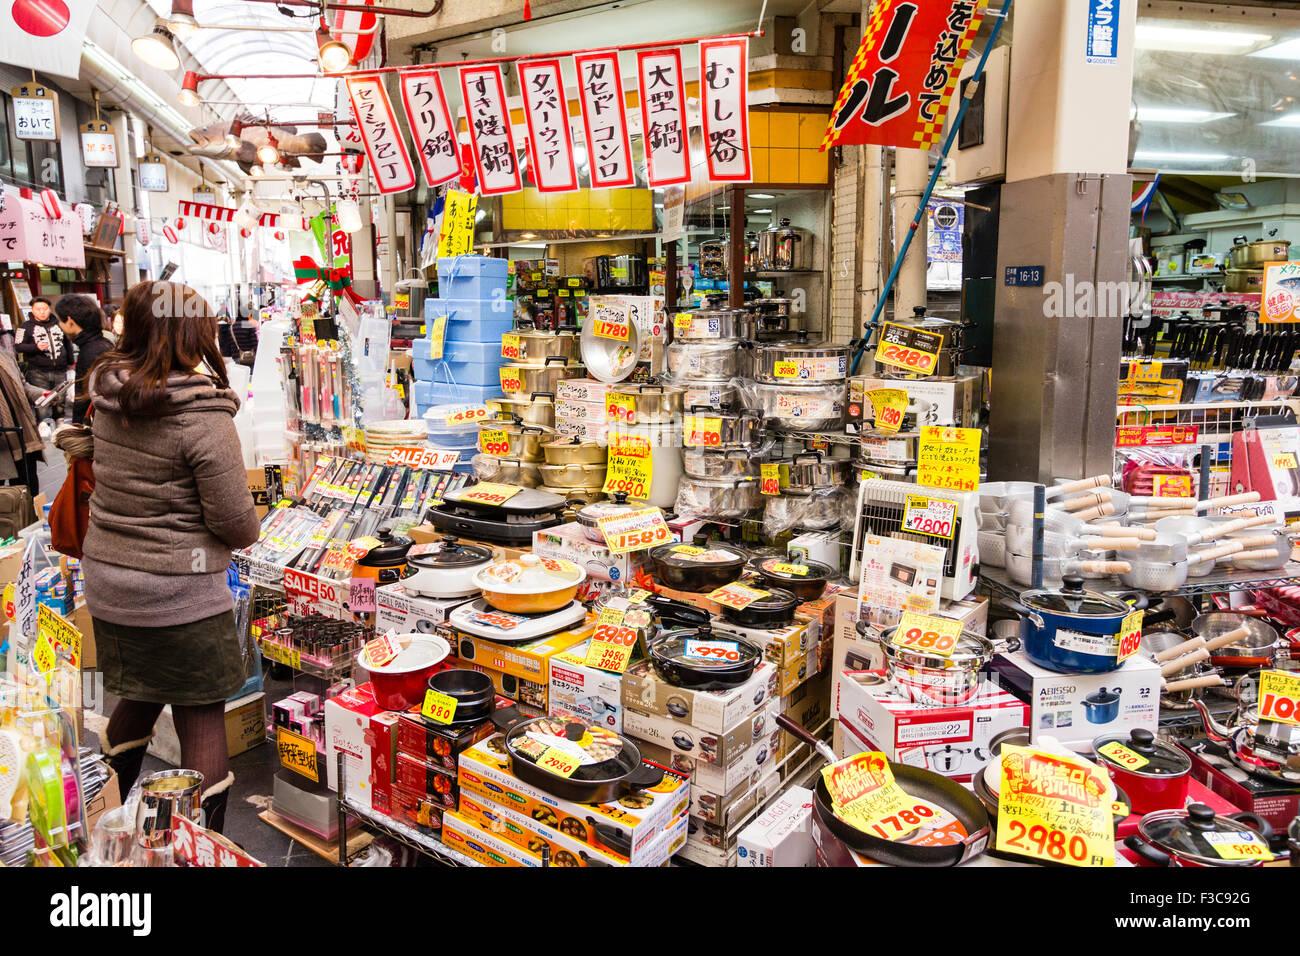 Japan osaka kuromon ichiba market osaka kitchen pops for Pops fish market